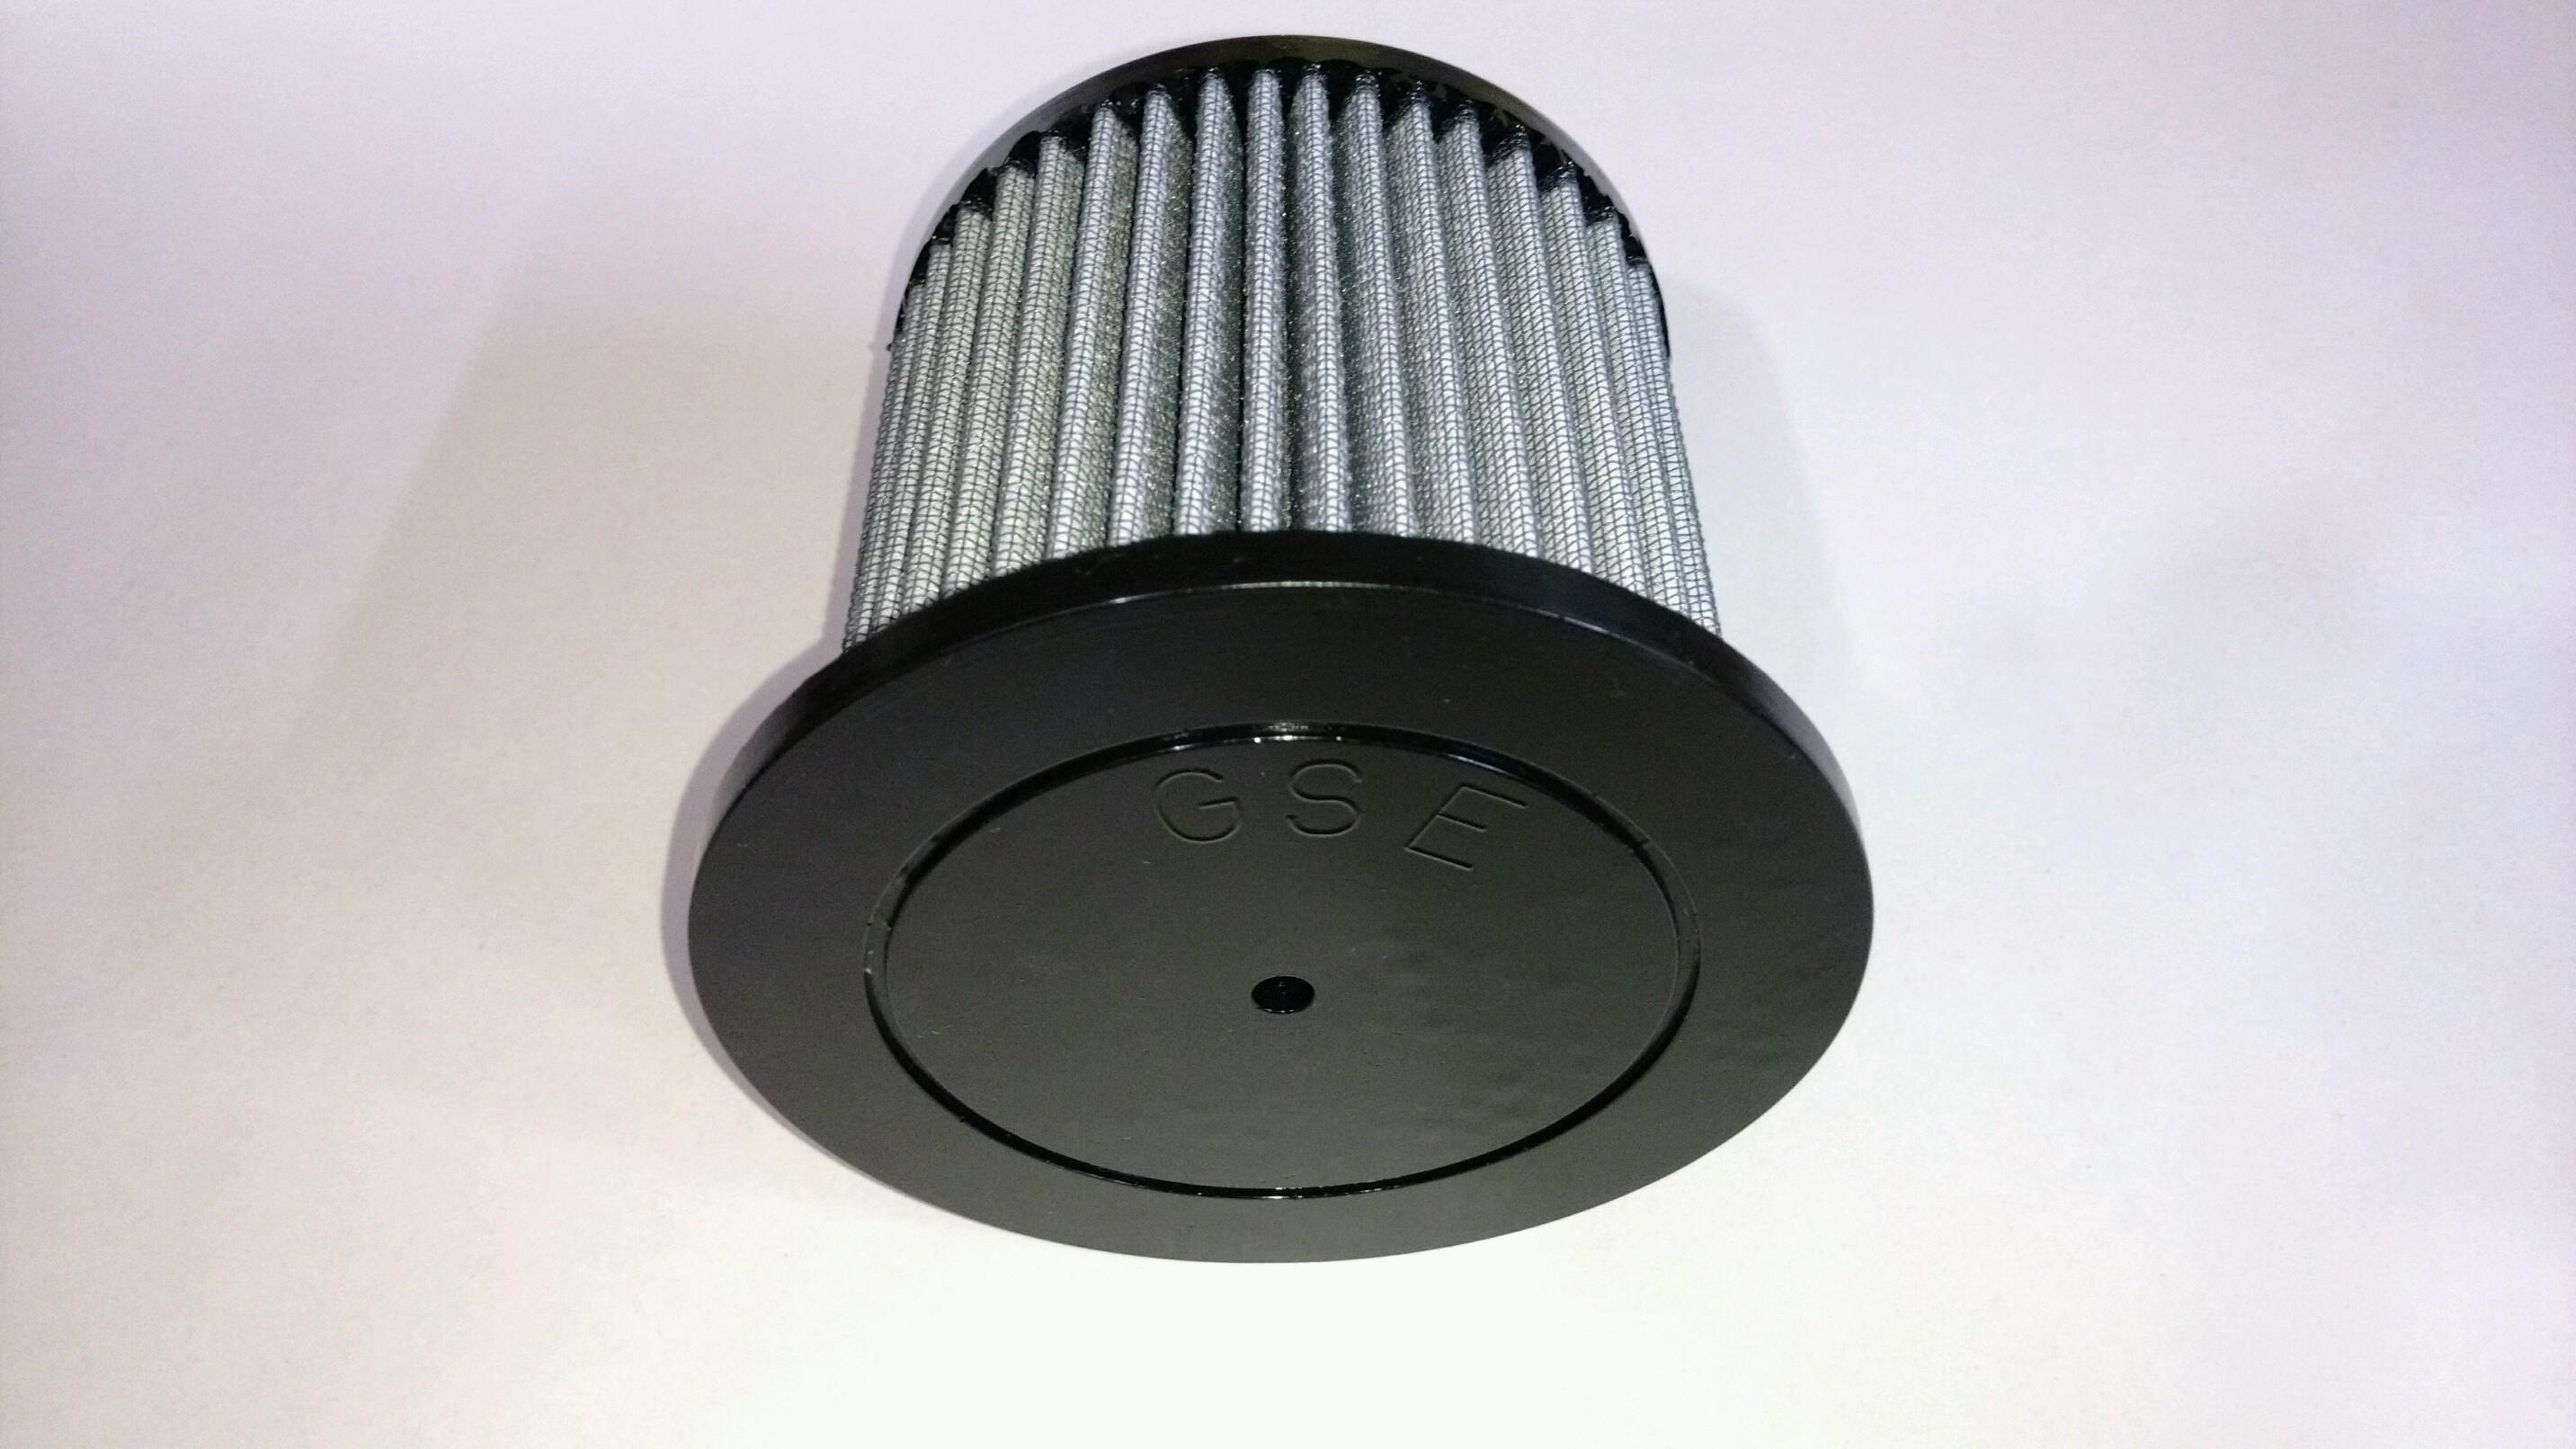 suzuki king quad 450 fuel filter